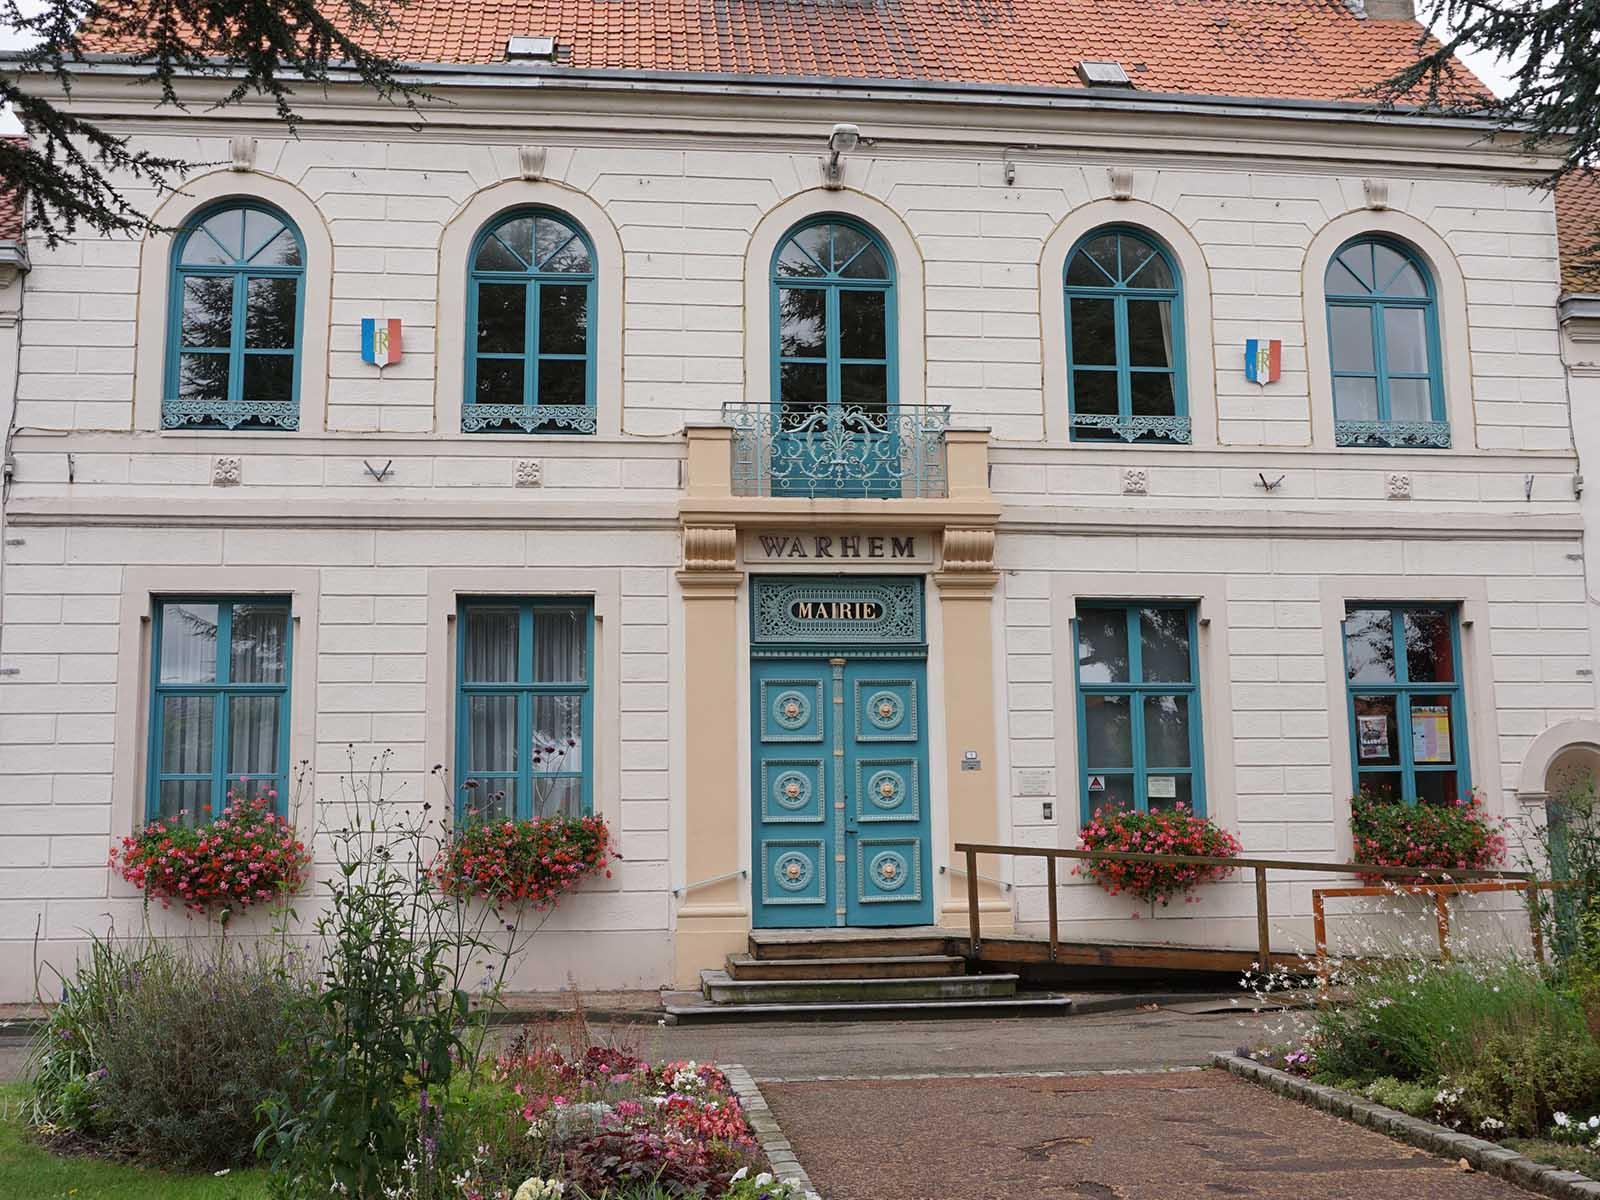 banniere-Mairie de Warhem.JPG